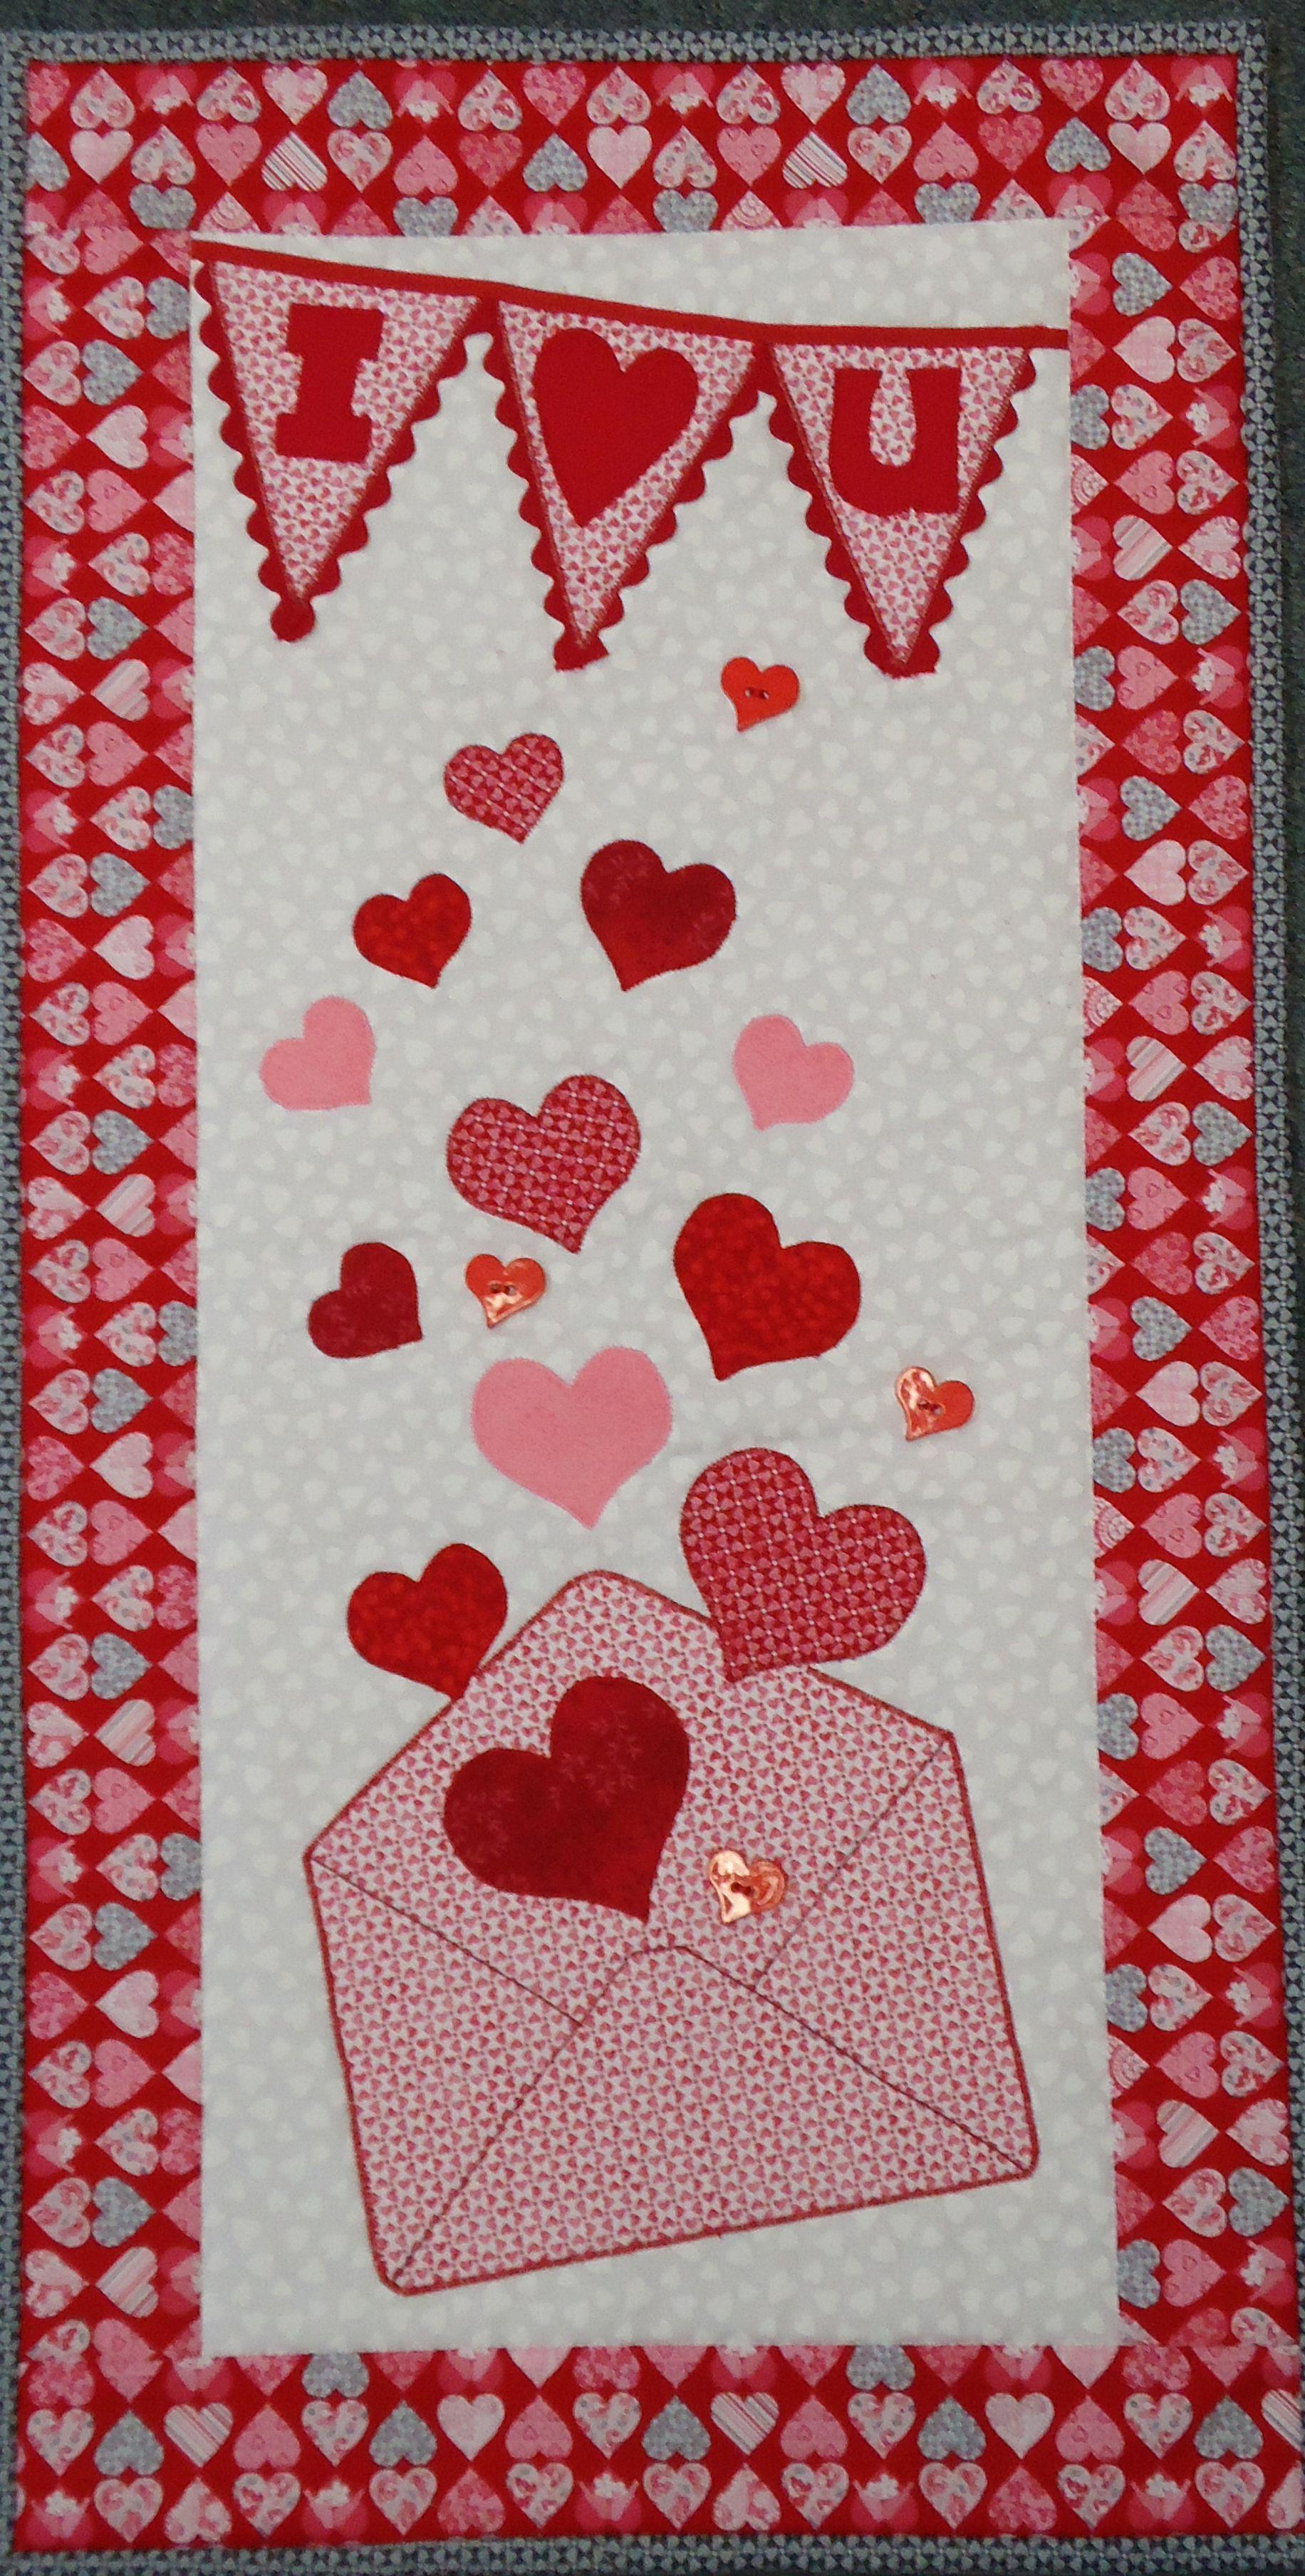 Love Letters Quilt Design Wall Valentines Door Hanger Diy Valentine S Day Decorations